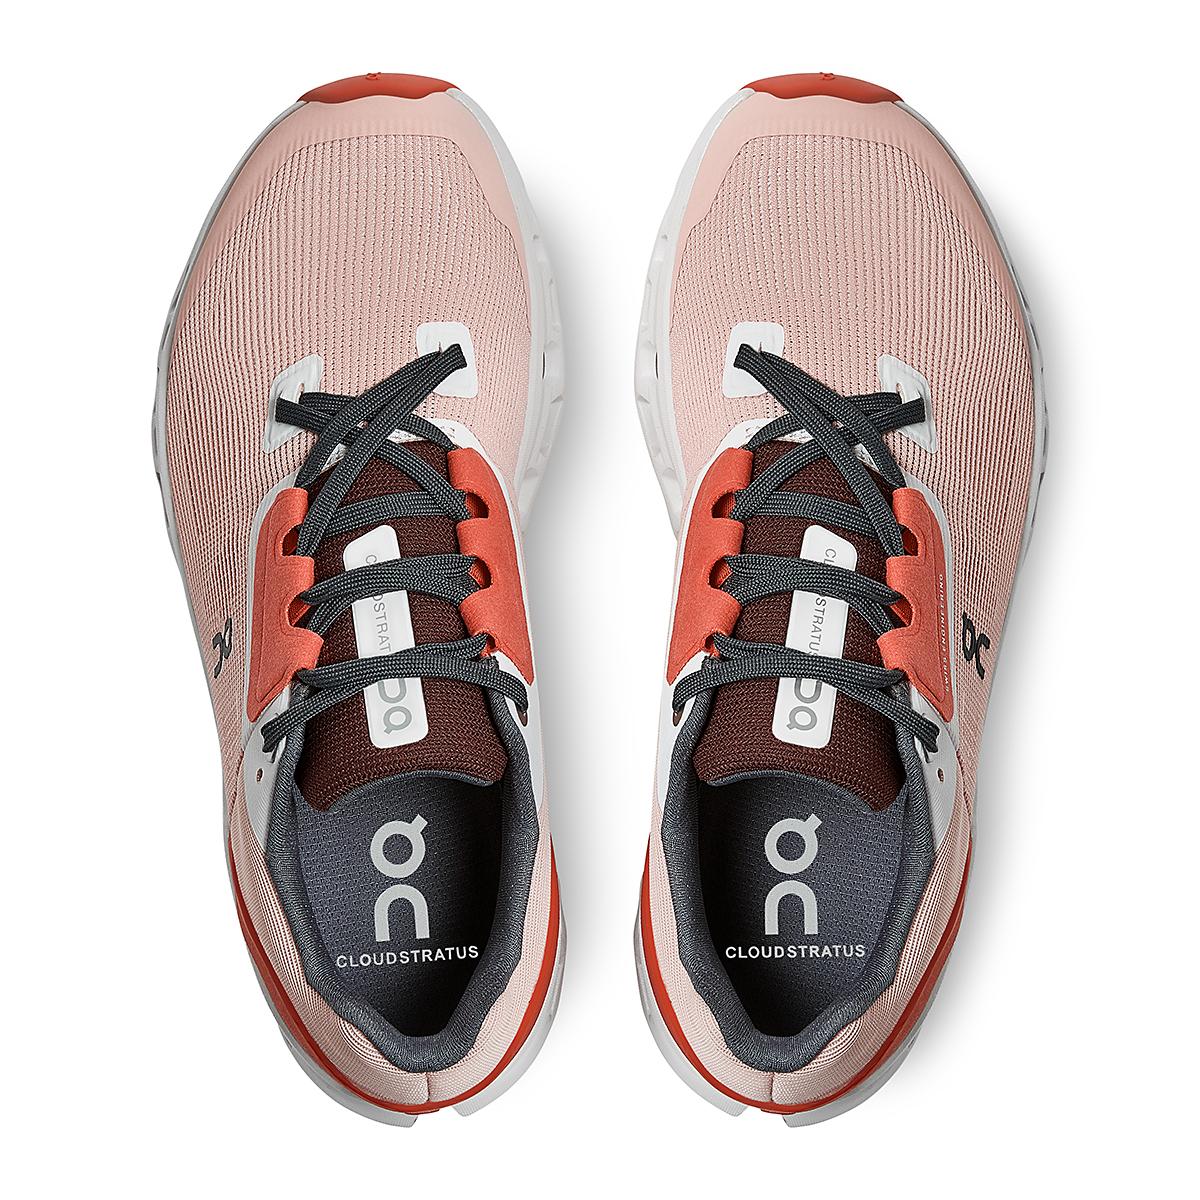 Women's On Cloudstratus 2.0 Running Shoe - Color: Rose/Red - Size: 5 - Width: Regular, Rose/Red, large, image 4